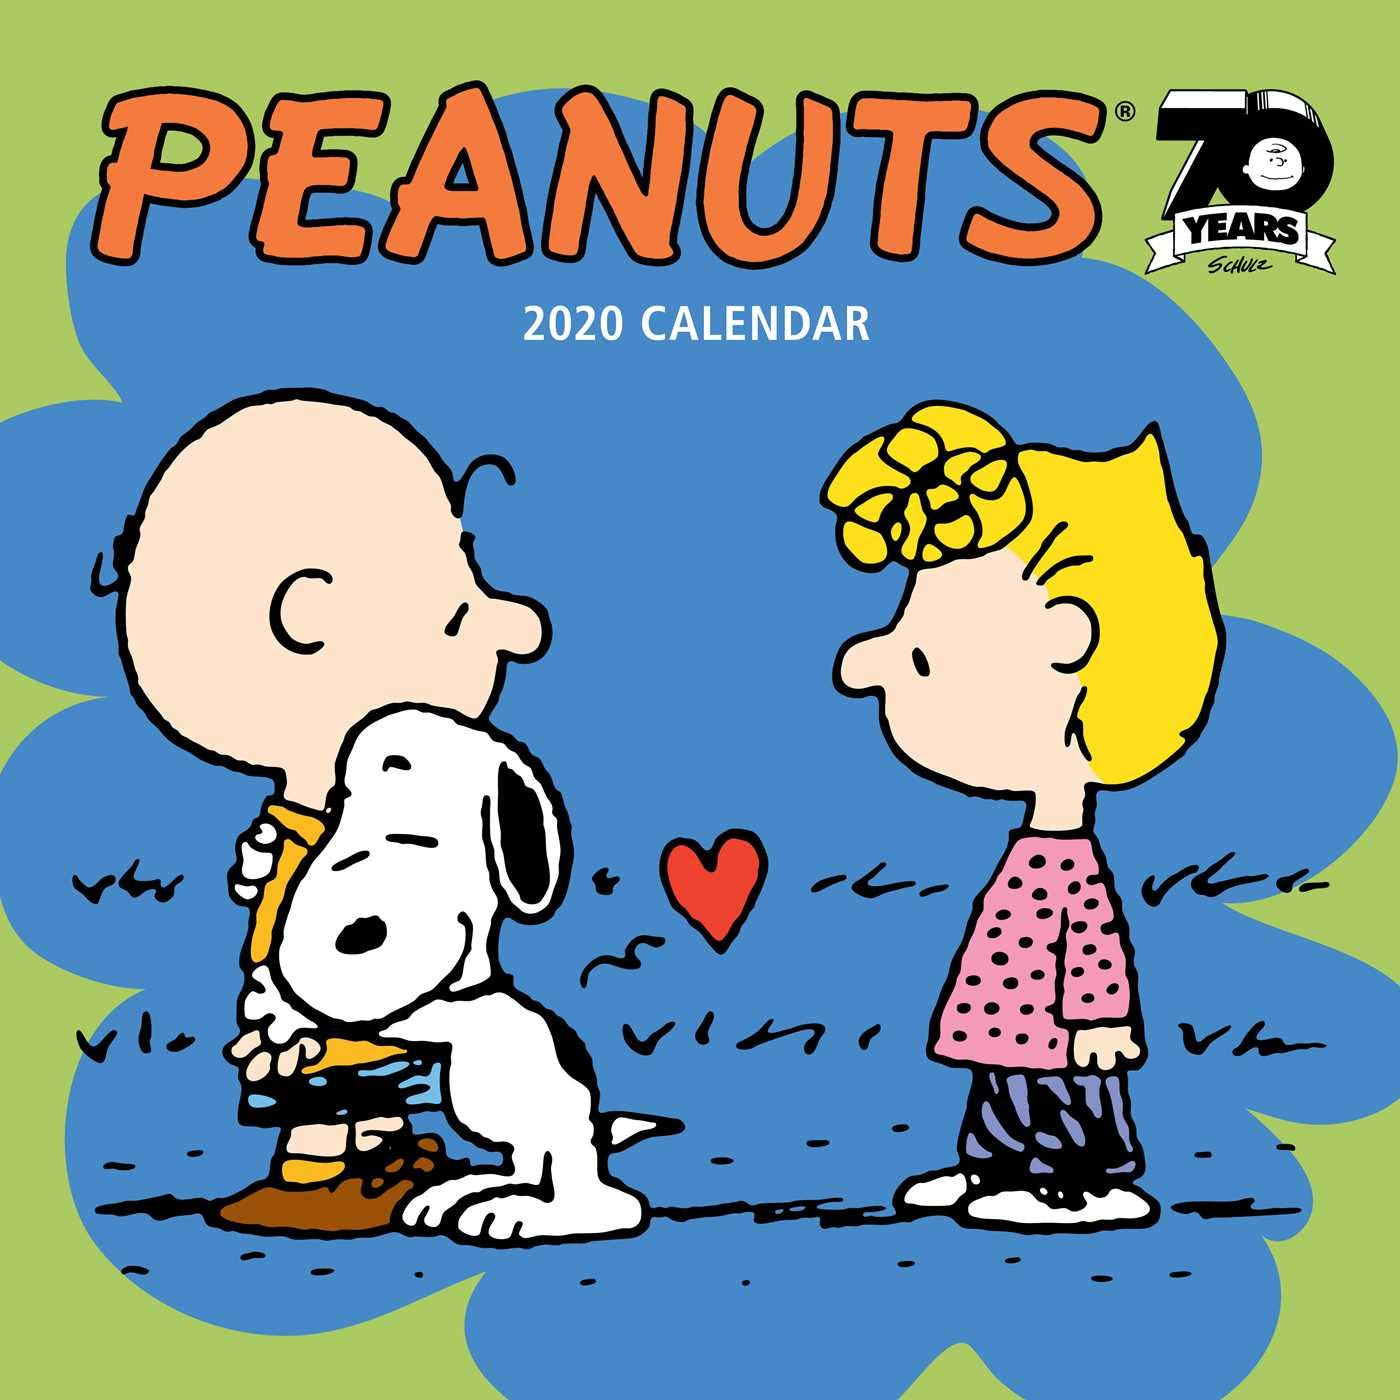 Calendario Snoopy 2020.Peanuts 2020 Calendar Amazon It Peanuts Worldwide Llc